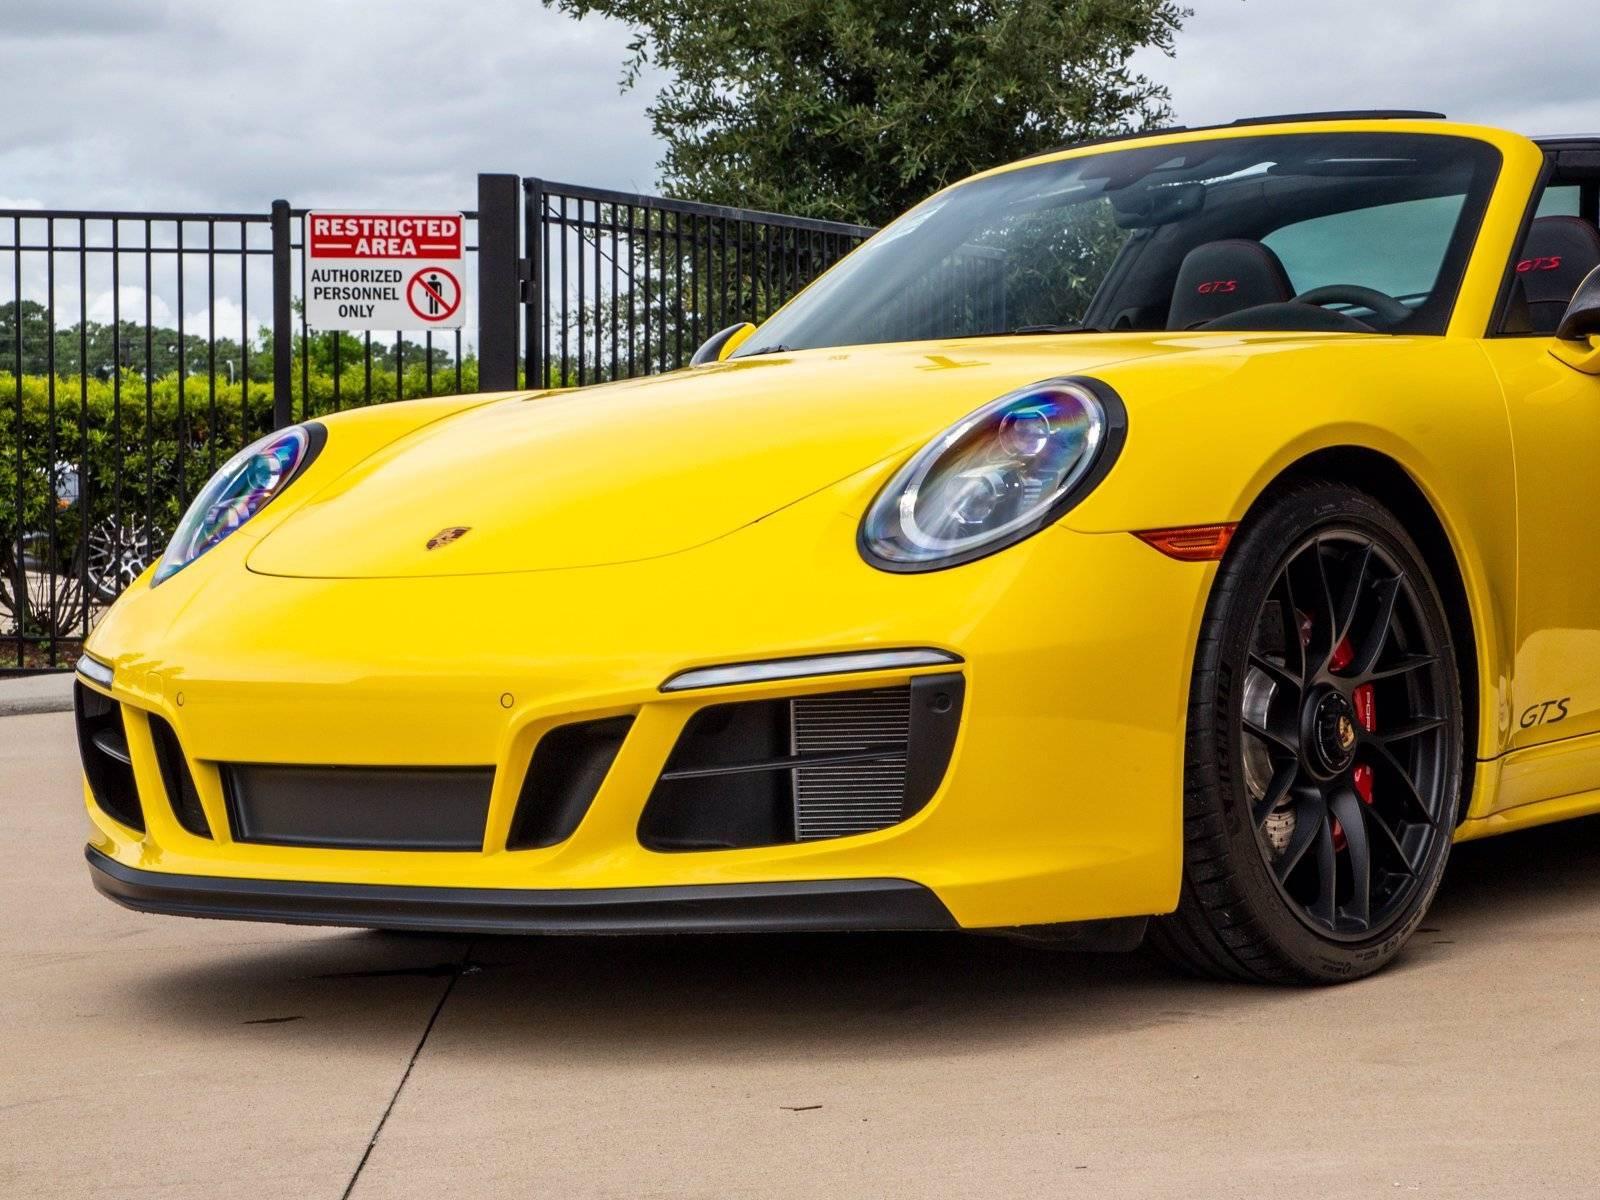 2019 Porsche 911 Targa 4 GTS – 4